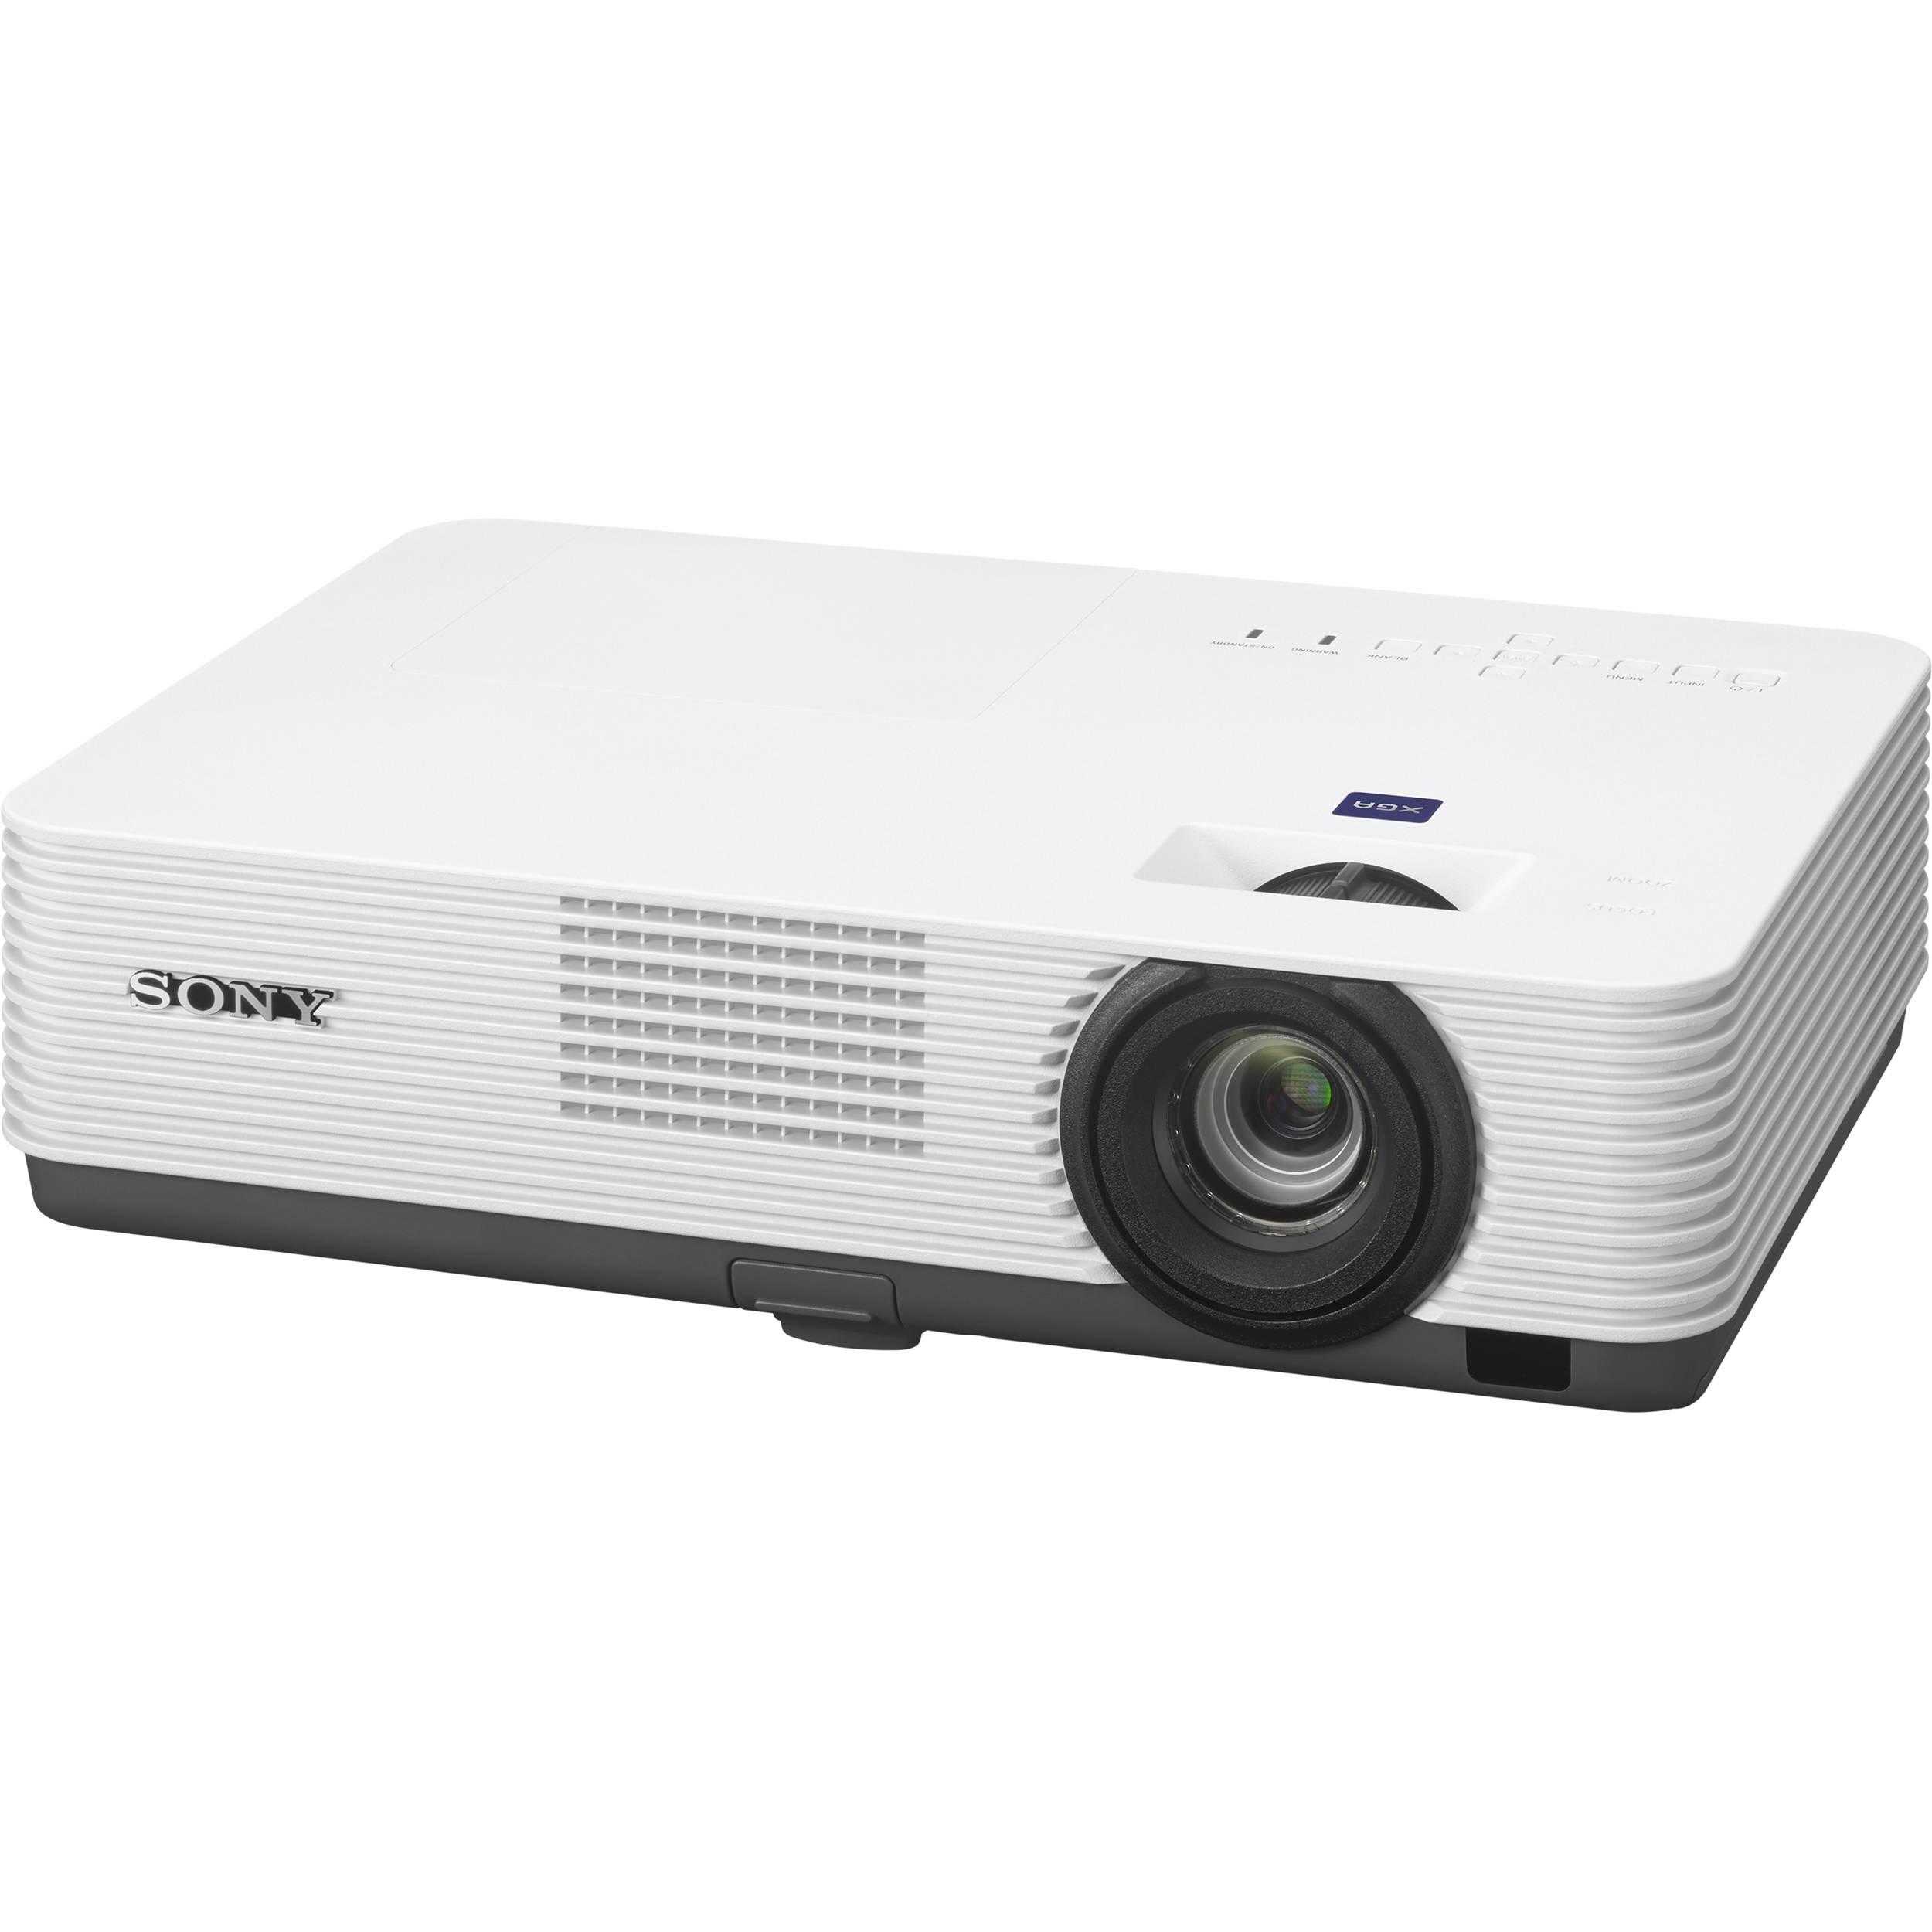 Sony 2800 Lumens Xga Desktop Projector White Vpl Dx221 B Amp H